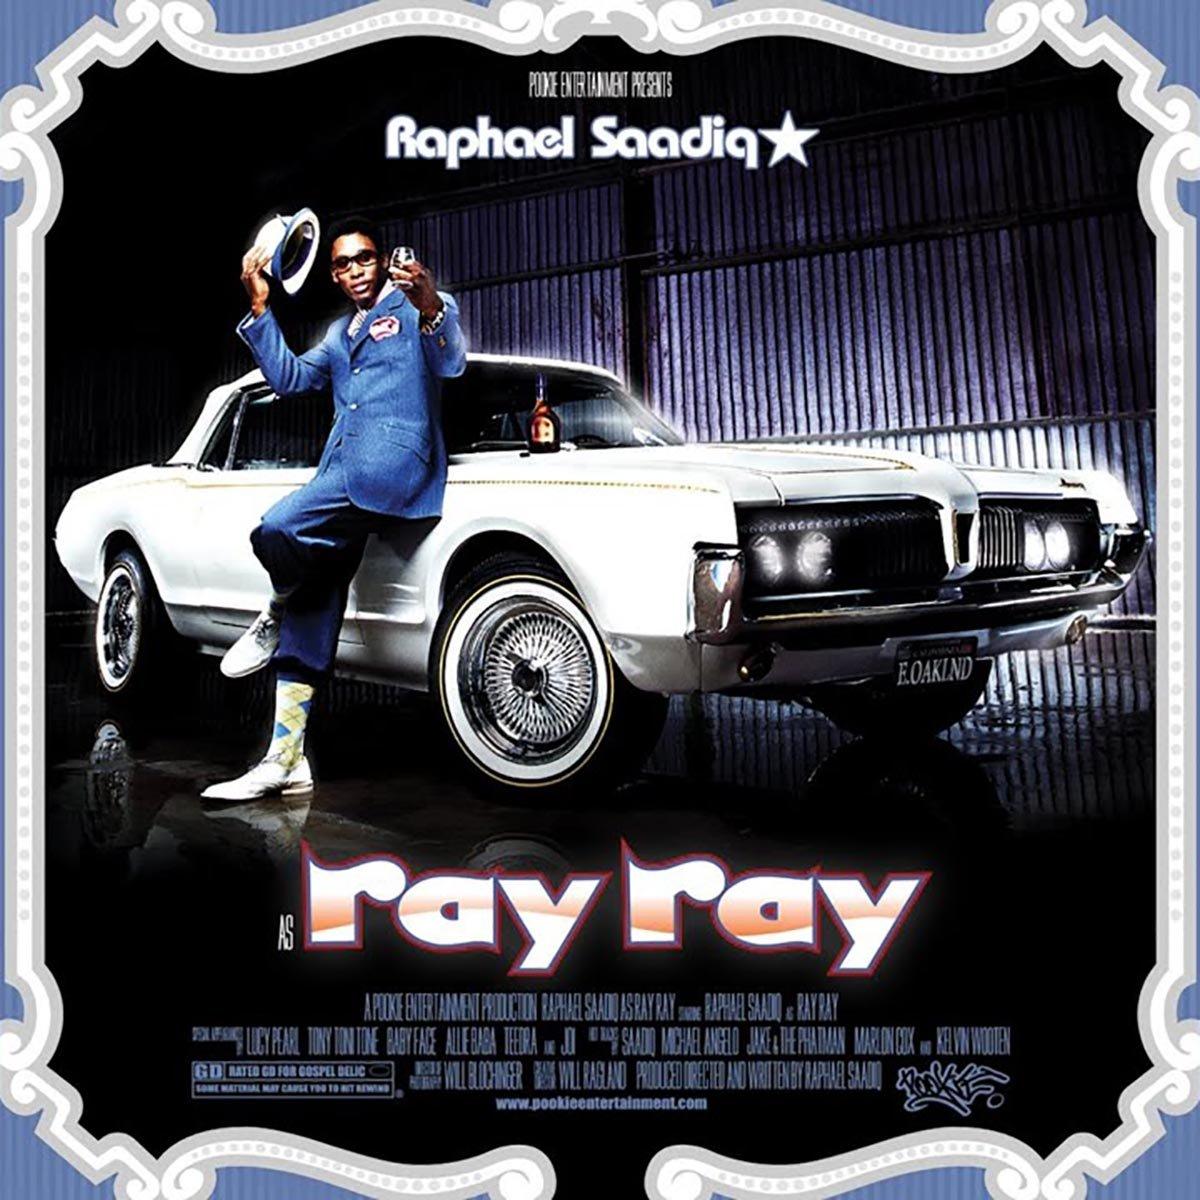 Raphael Saadiq, Ray Ray